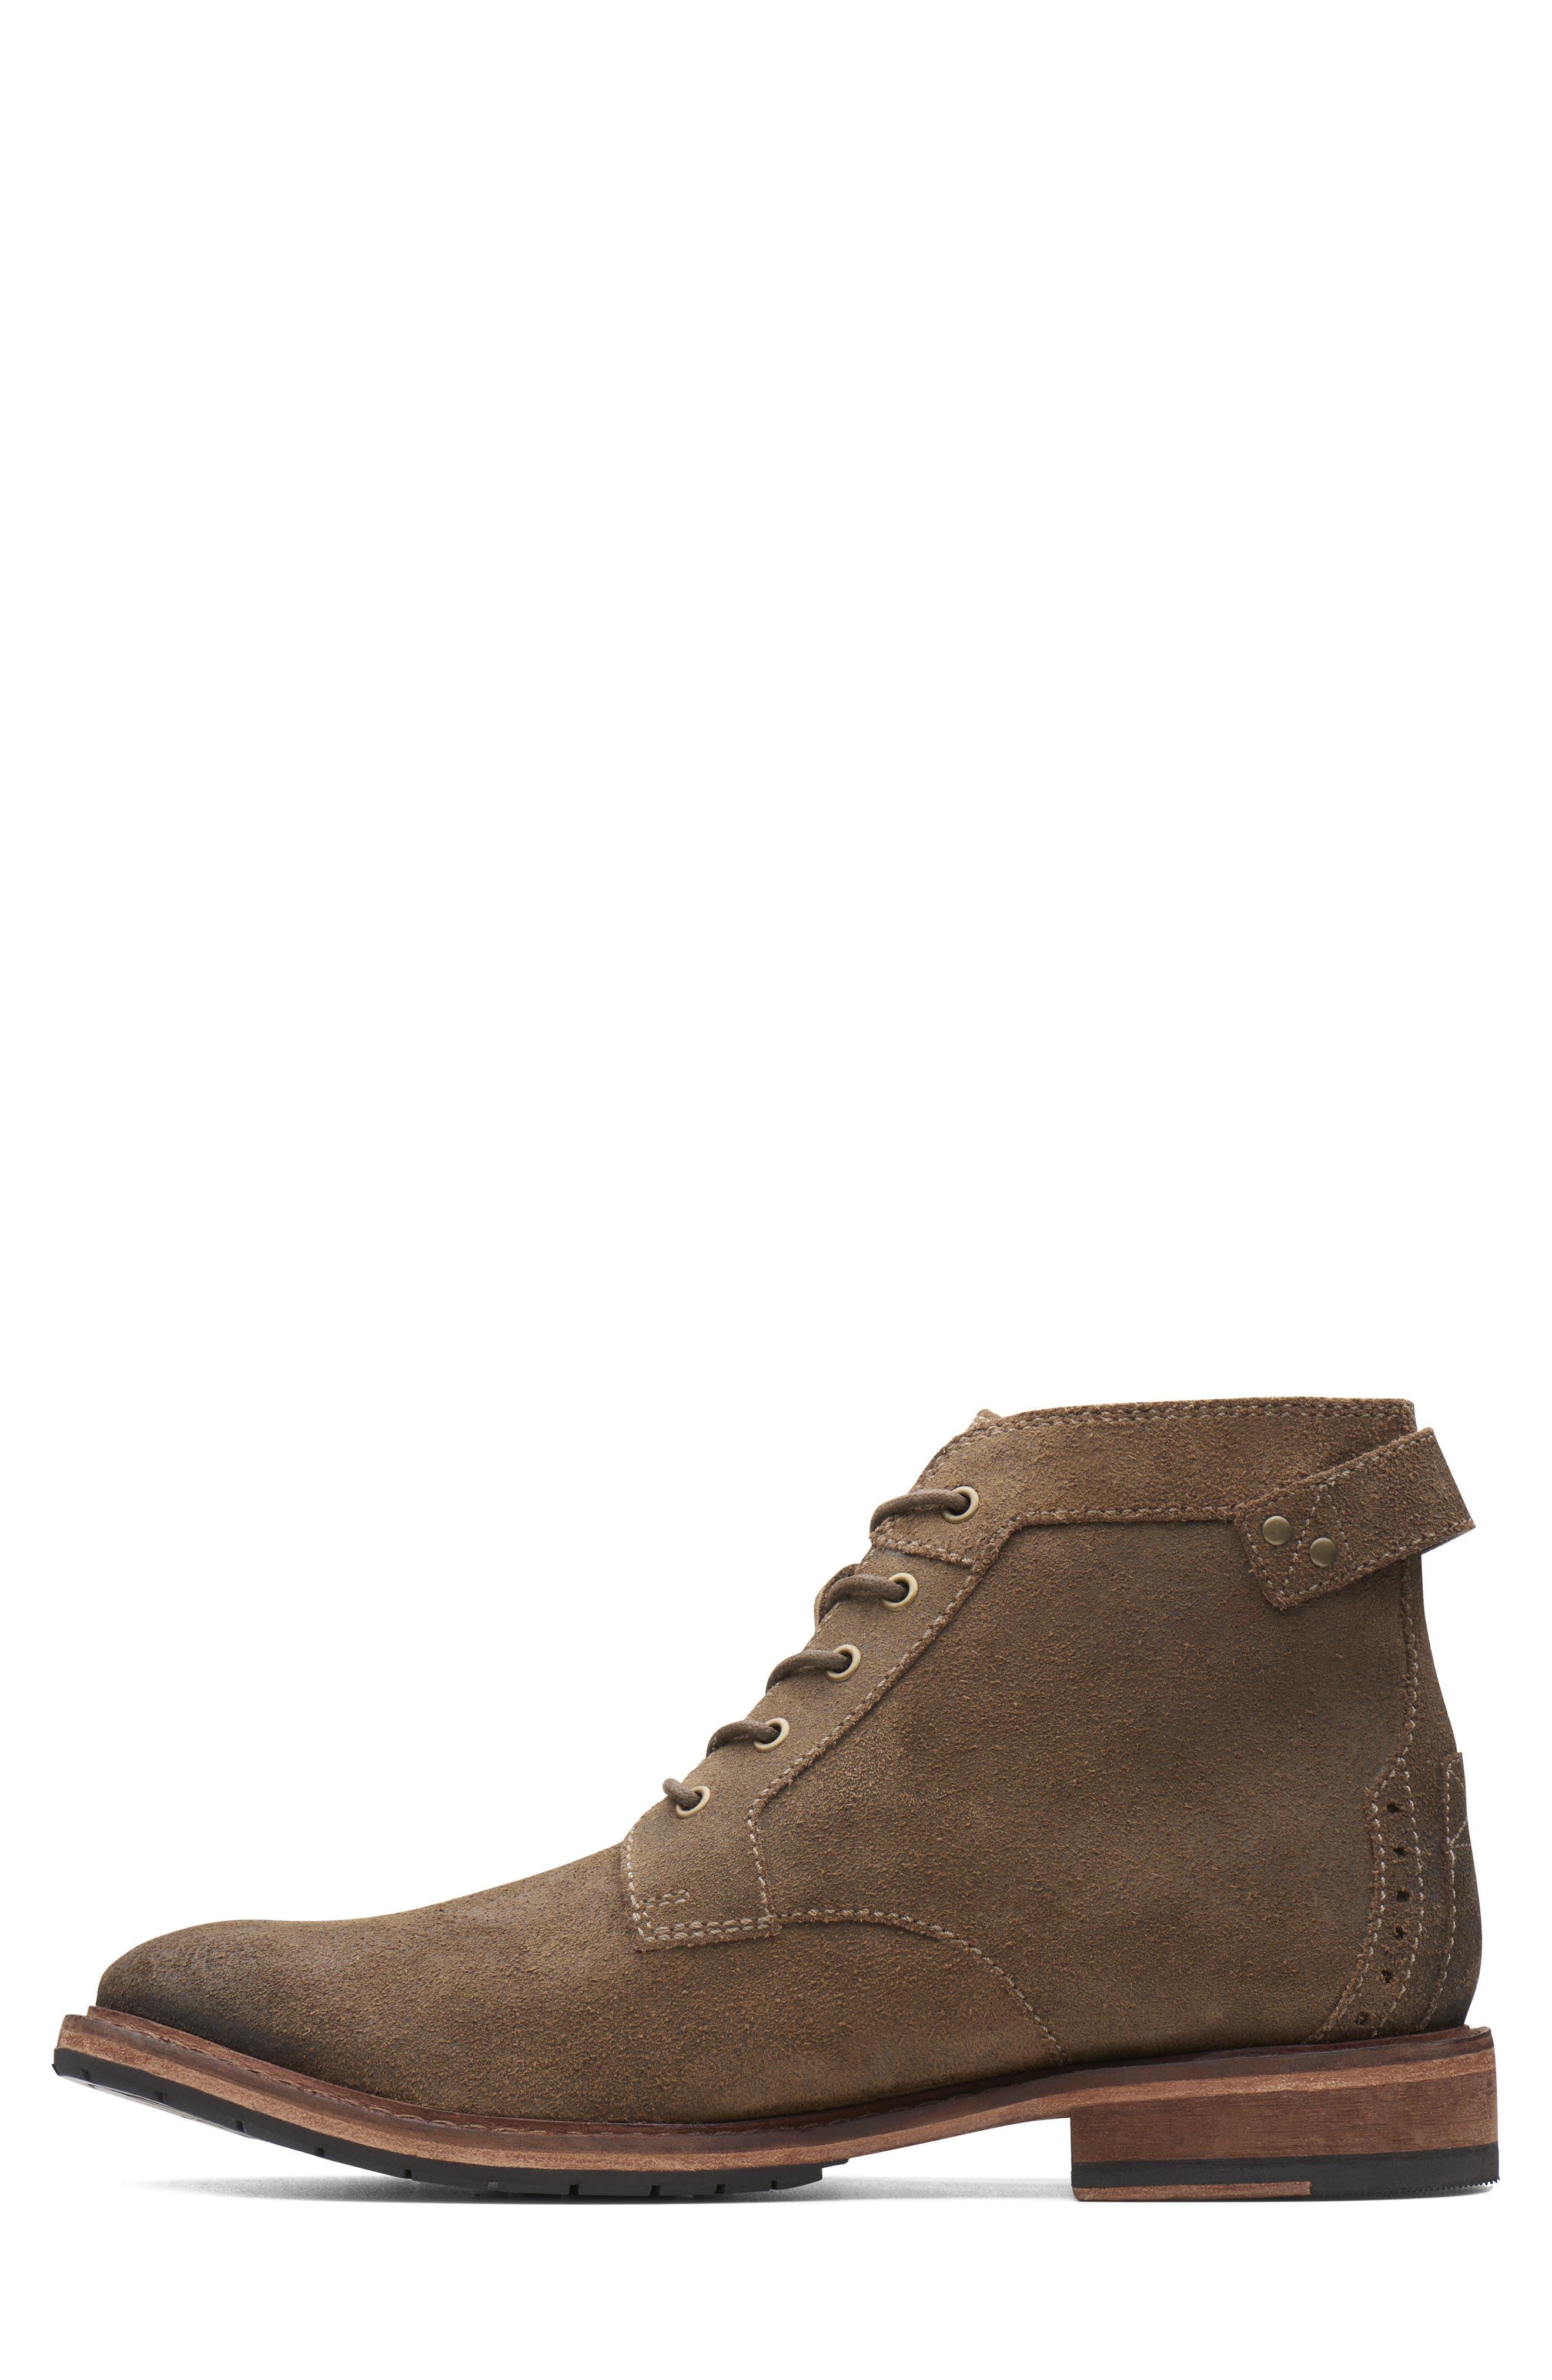 Clarkdale Bud Plain Toe Boot,                             Alternate thumbnail 5, color,                             KHAKI SUEDE